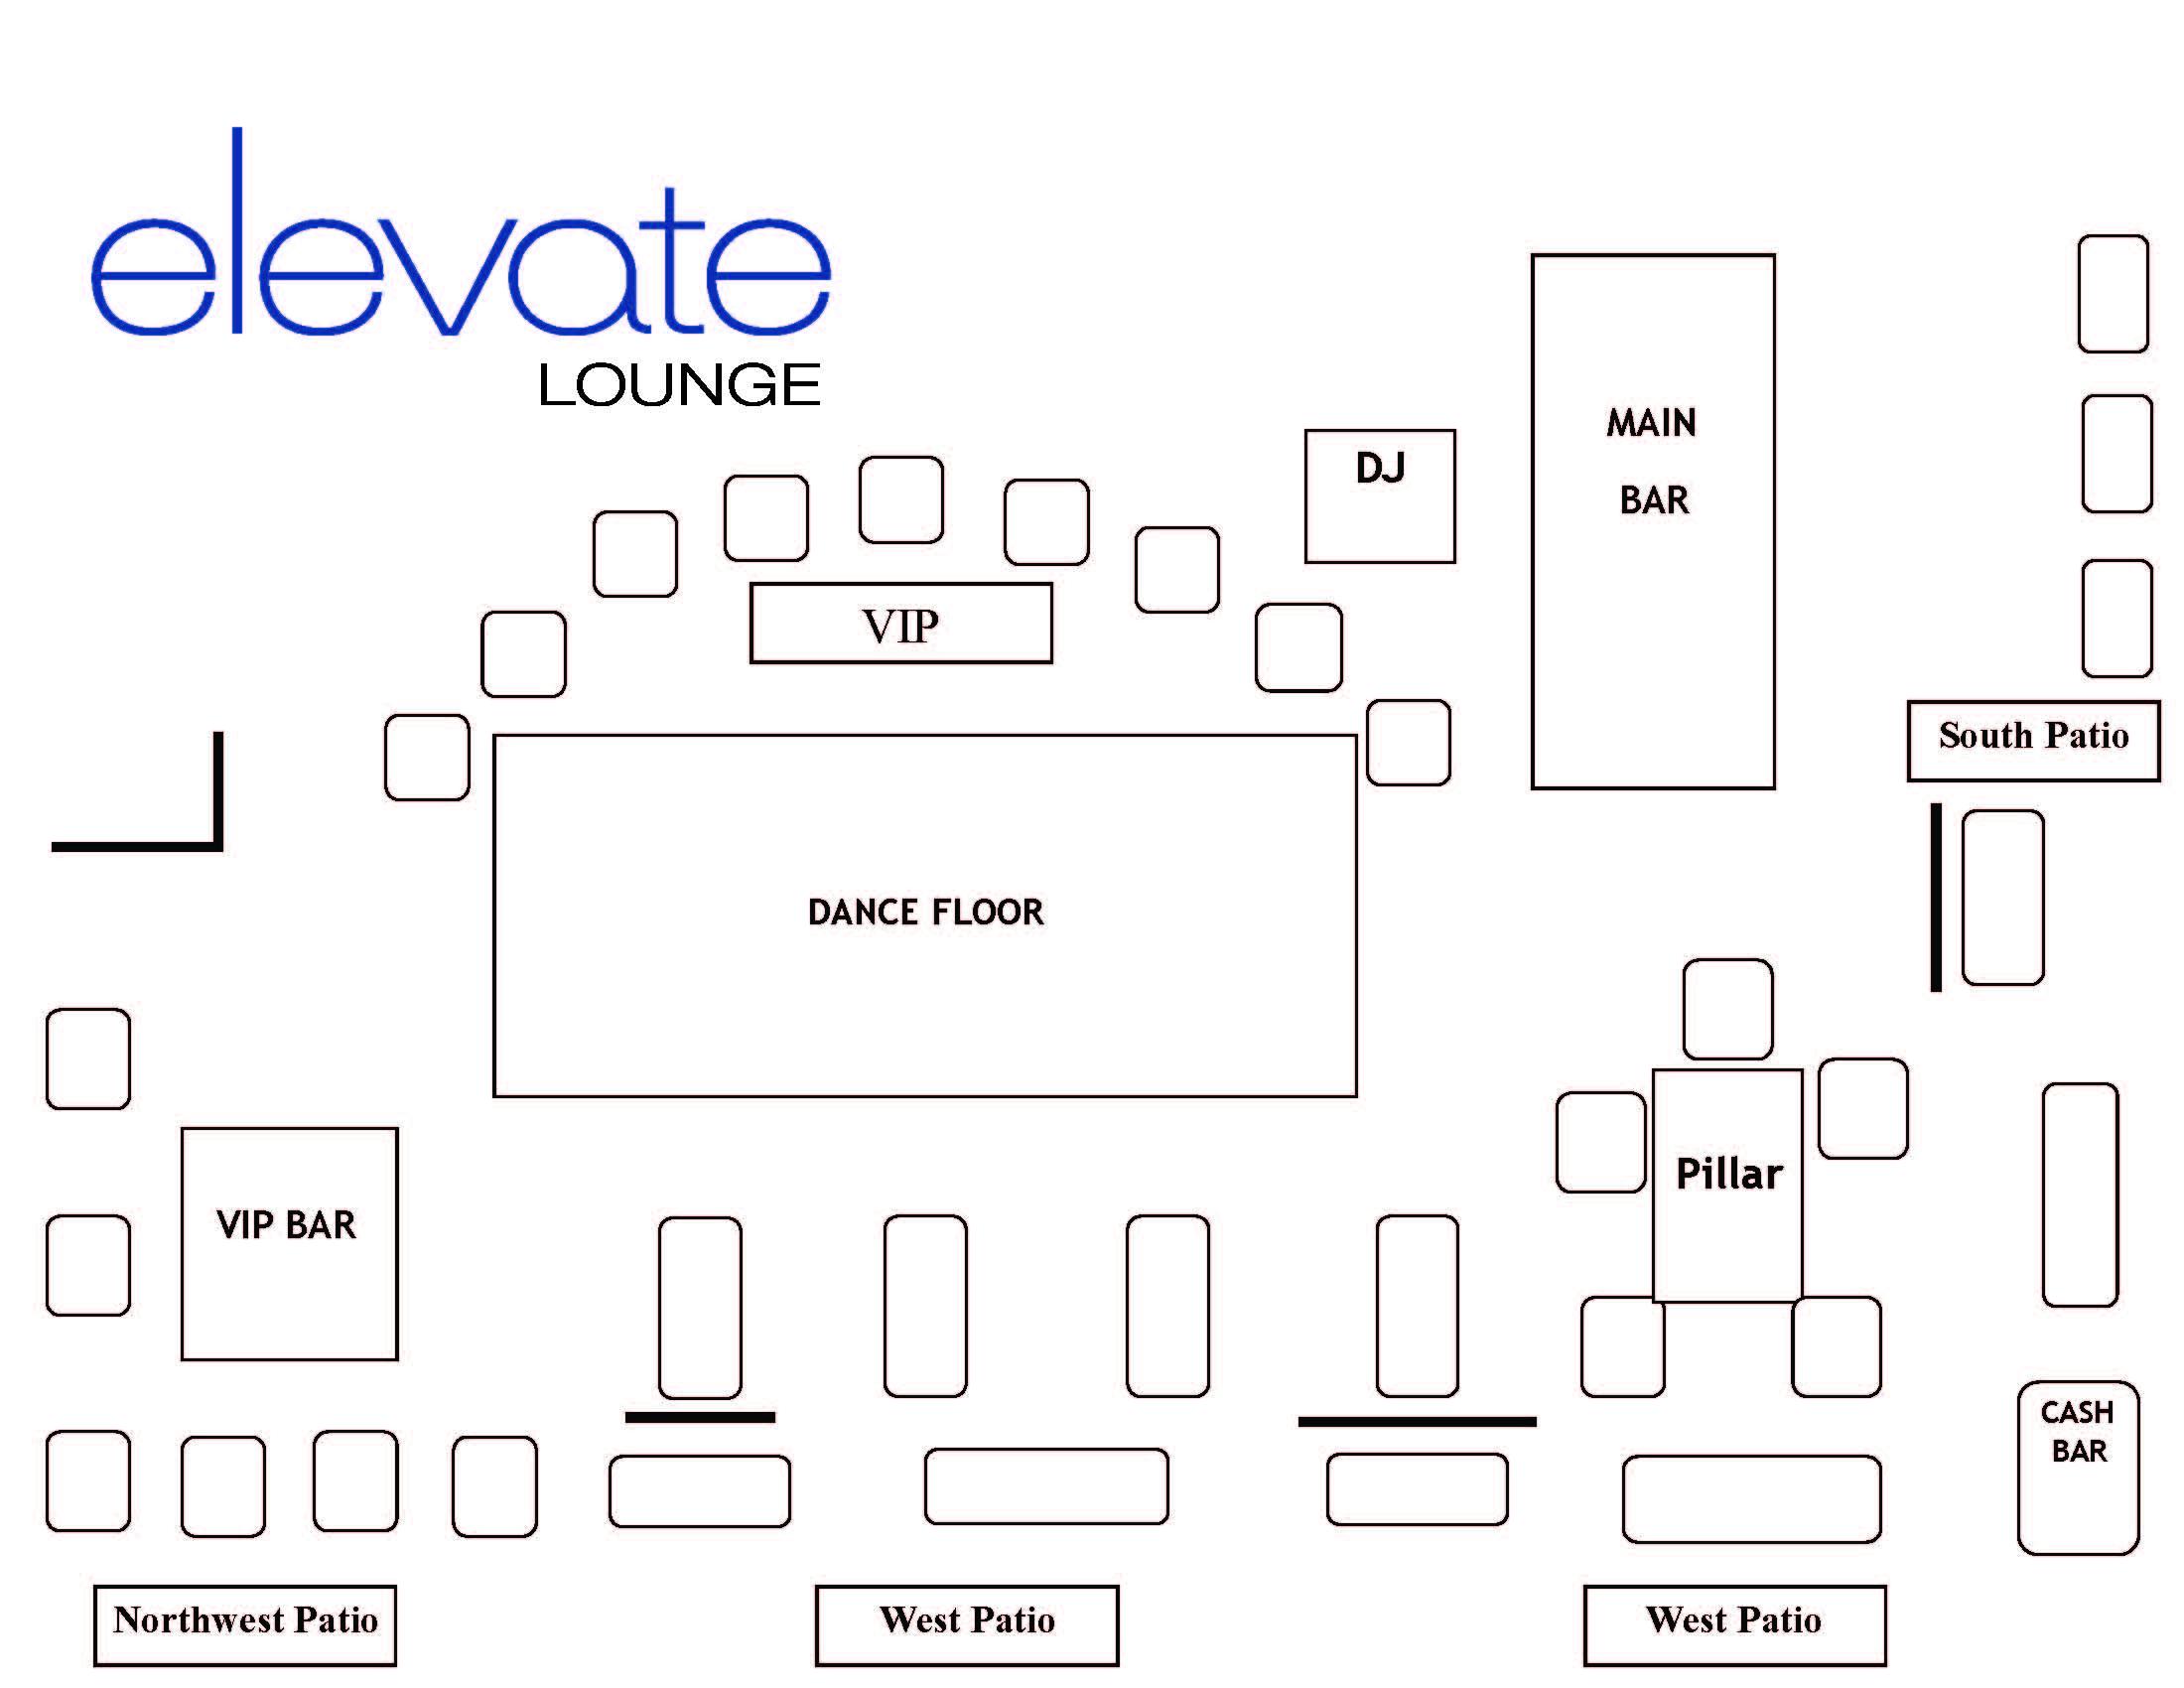 Elevate Lounge Bottle Service Discotech The 1